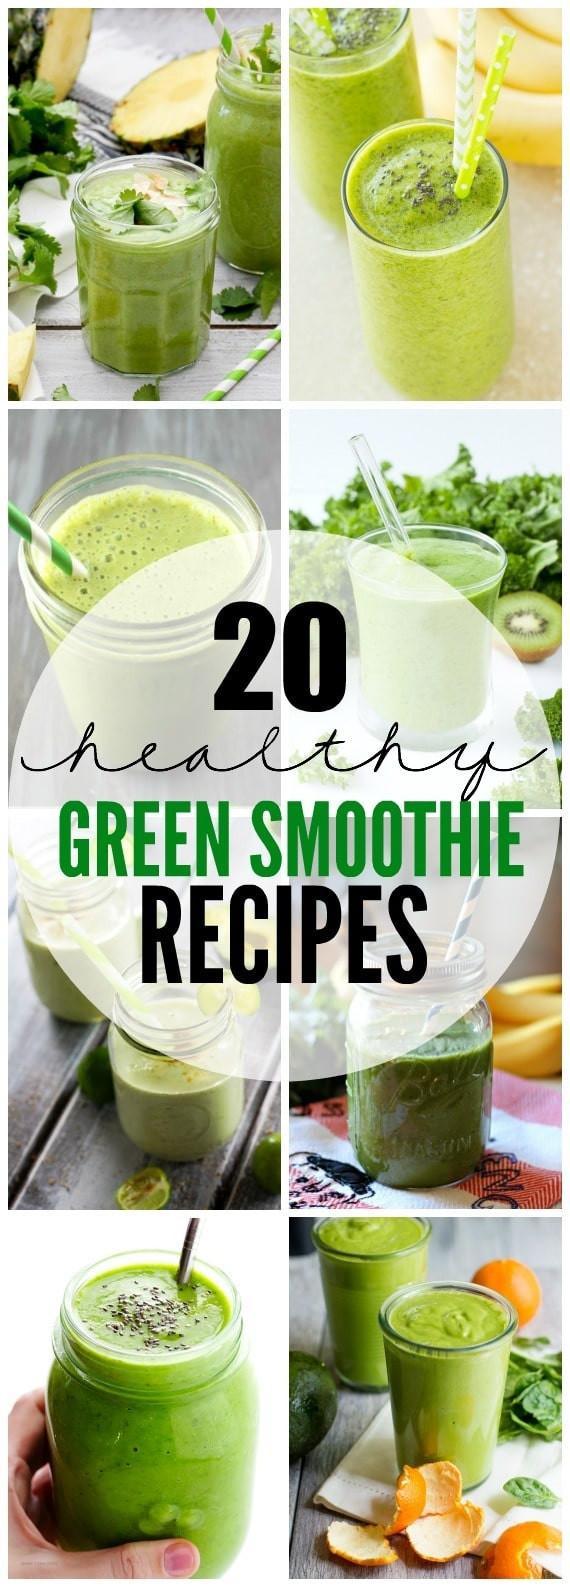 Organic Smoothie Recipes  Foods for Children s Dental Health Health Alliance Blog